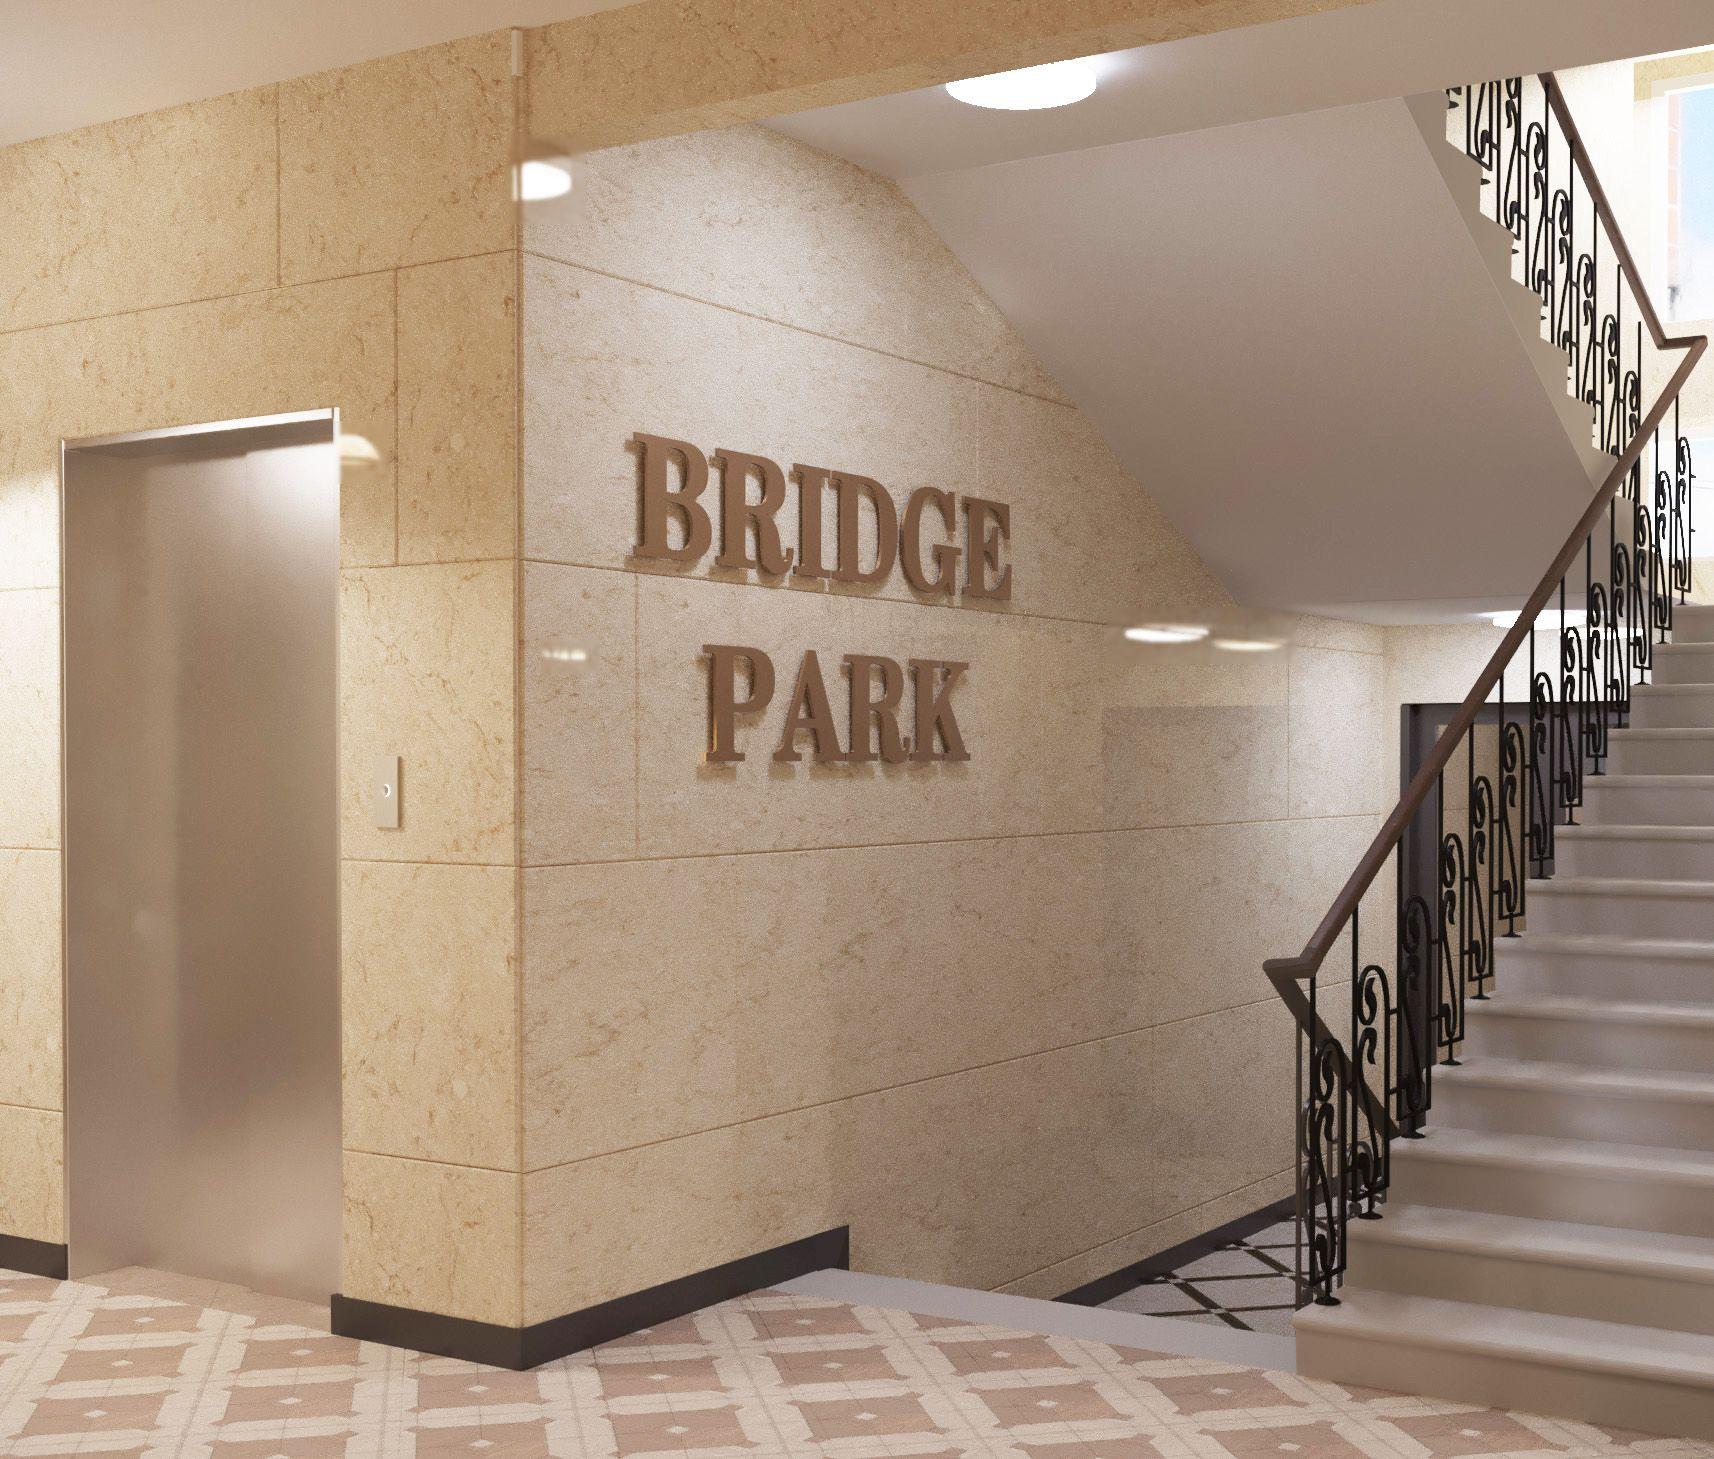 купить квартиру в ЖК Bridge park (Бридж парк)